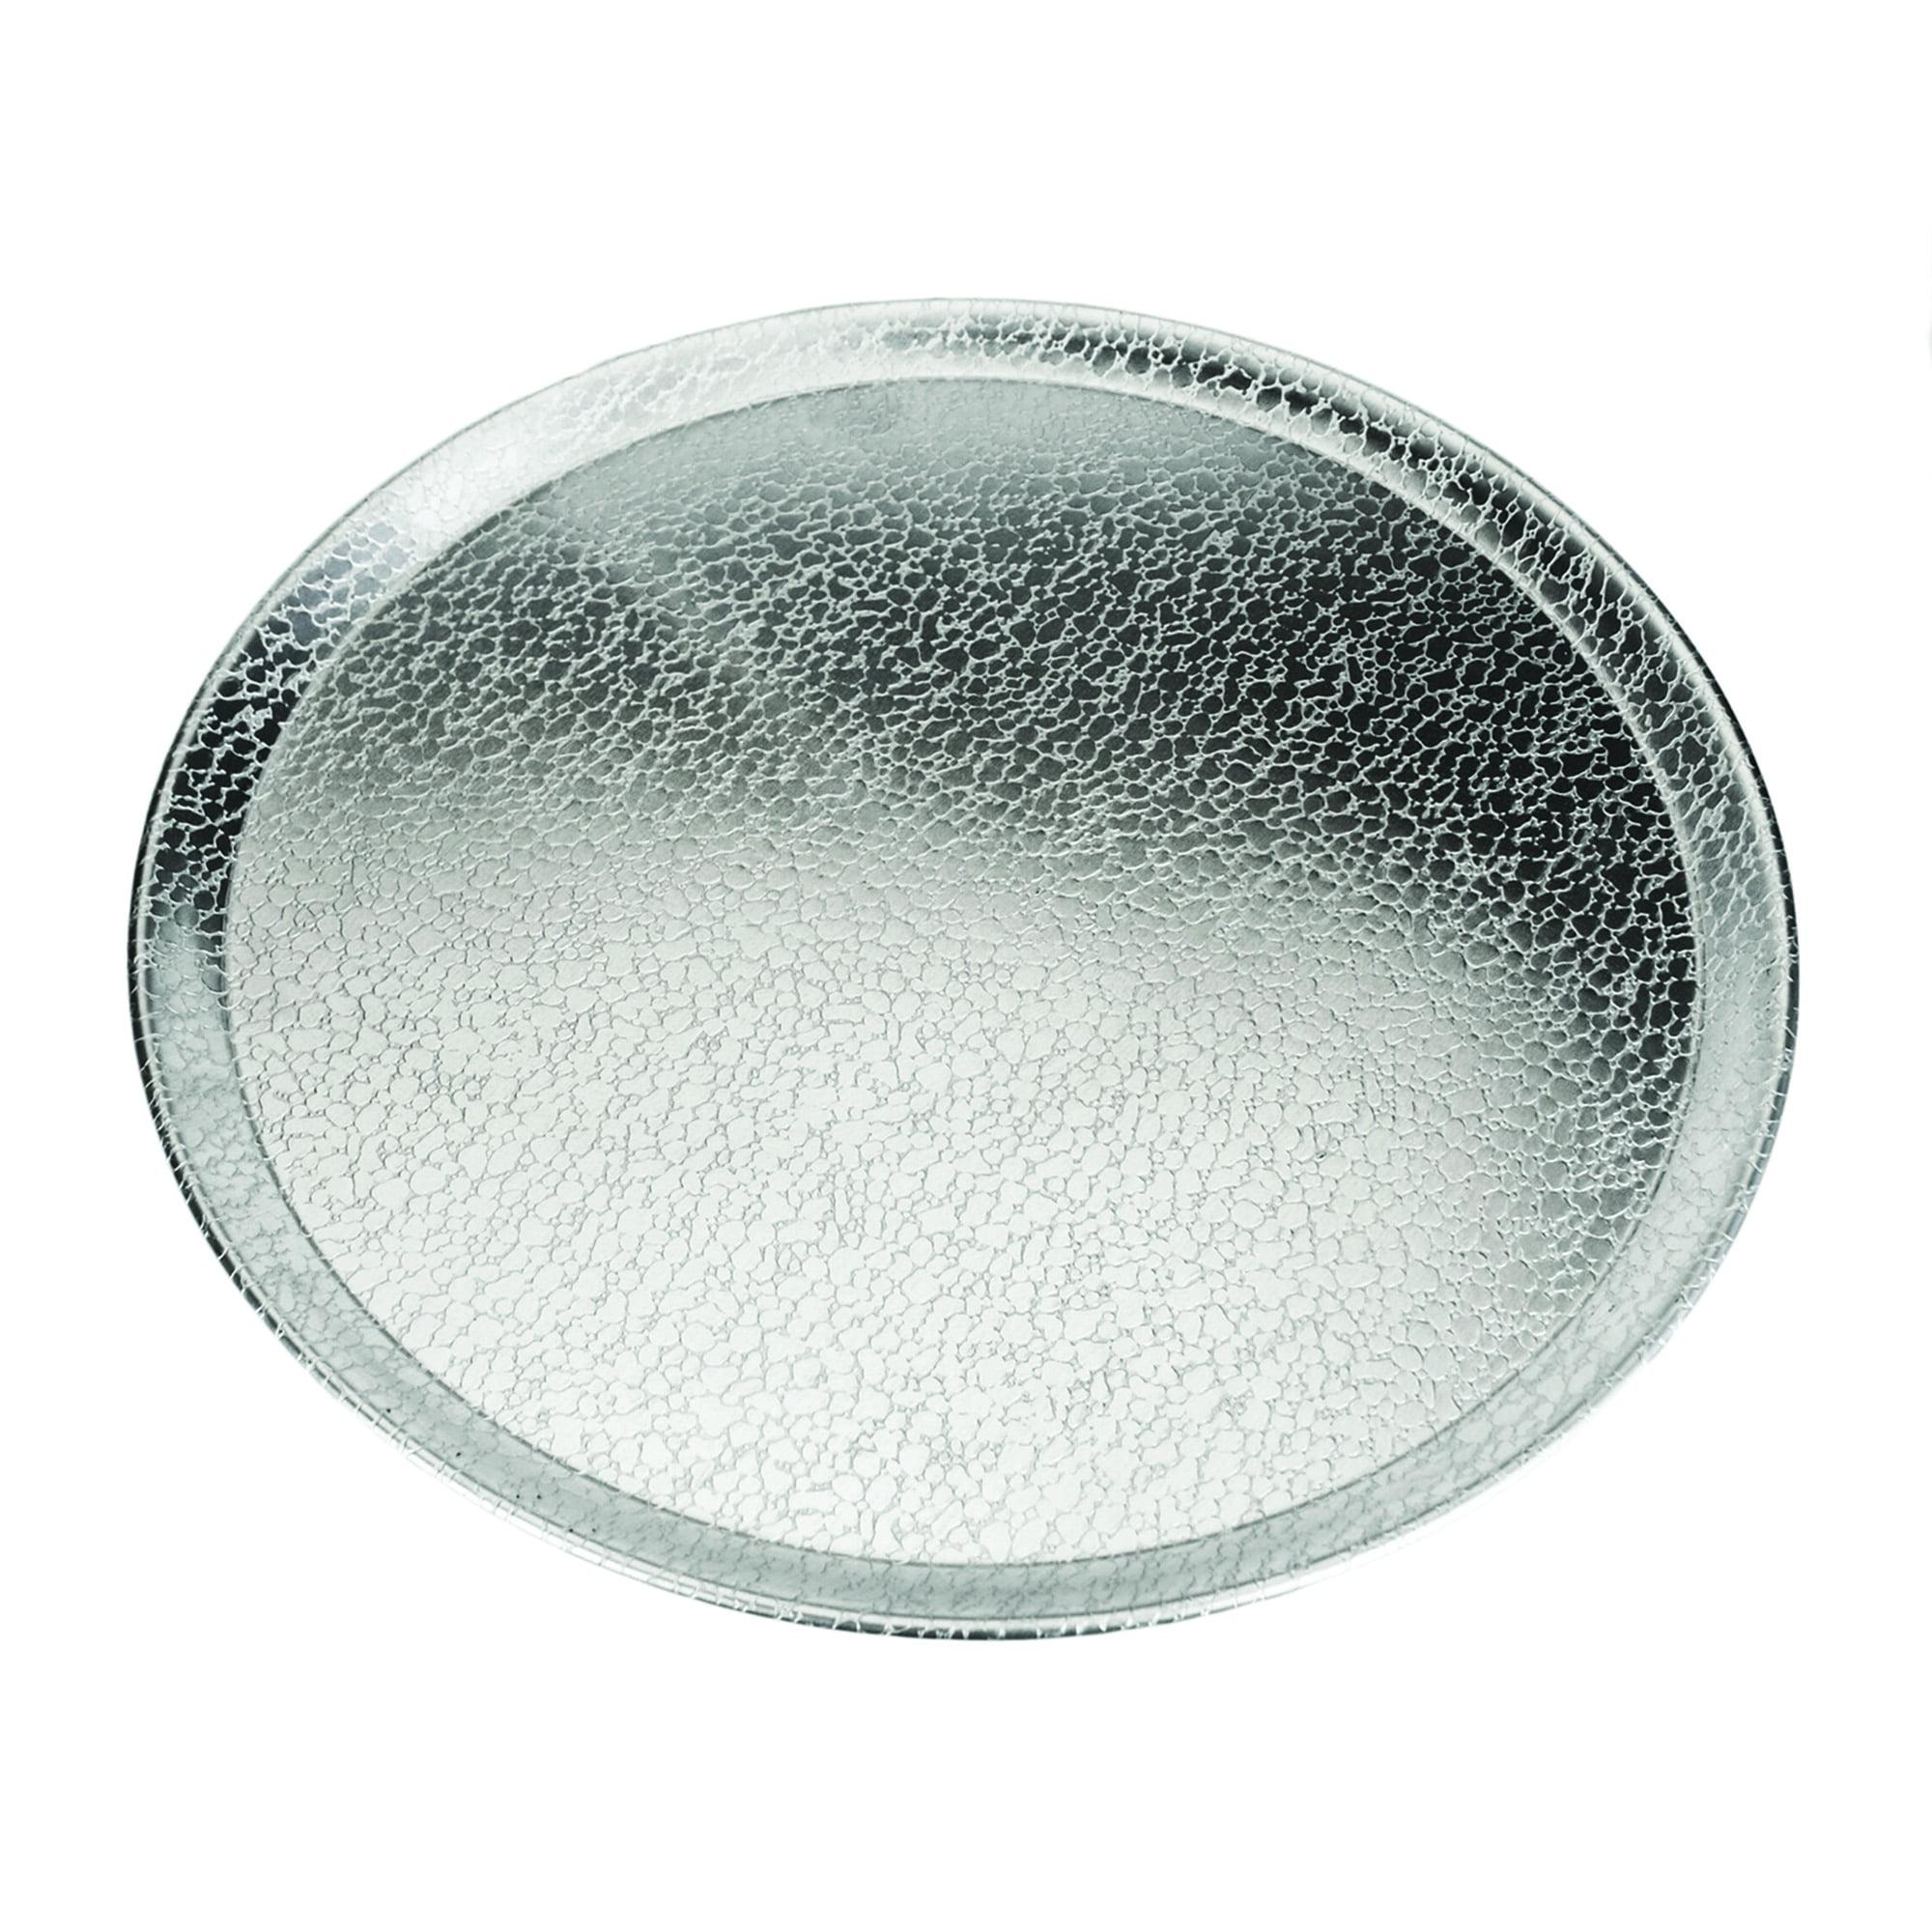 "15"" Pizza Pan, Original Non-Stick Pebble Pattern by Fox Run Brands"